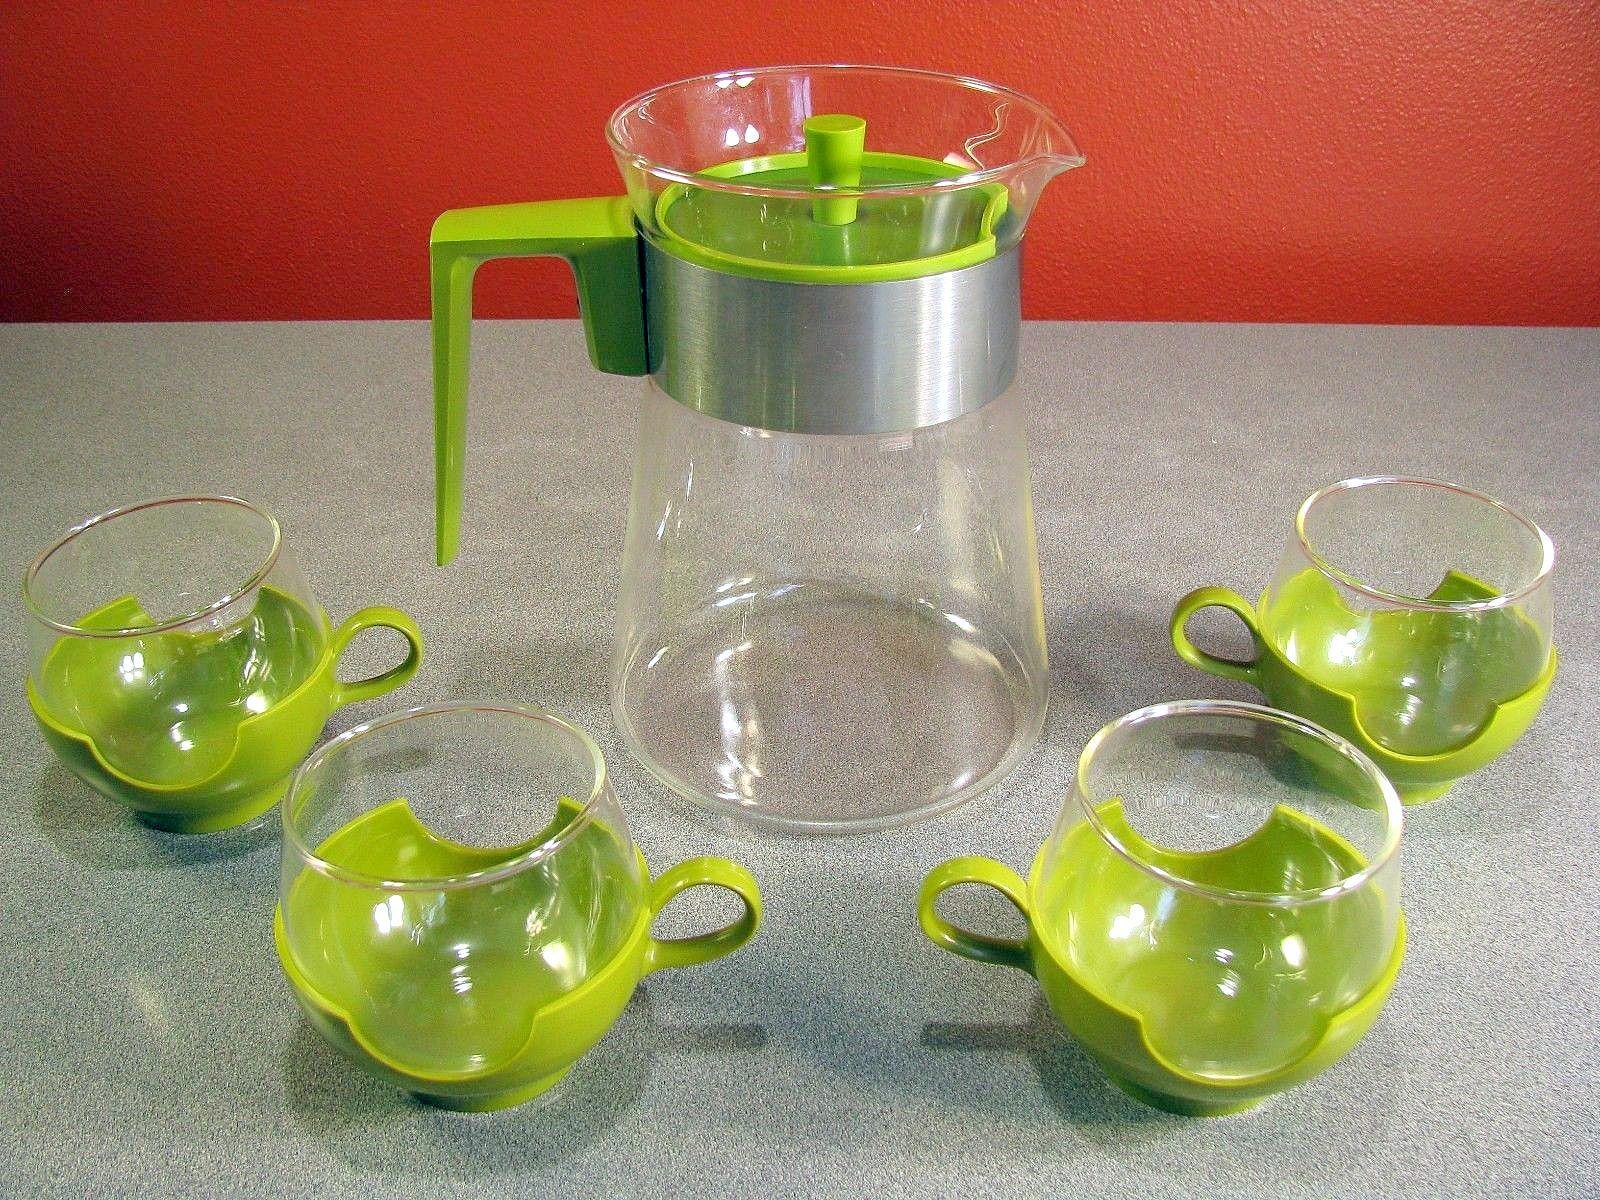 Vintage Pyrex Coffee Carafe and Coffee Mugs Pyrex